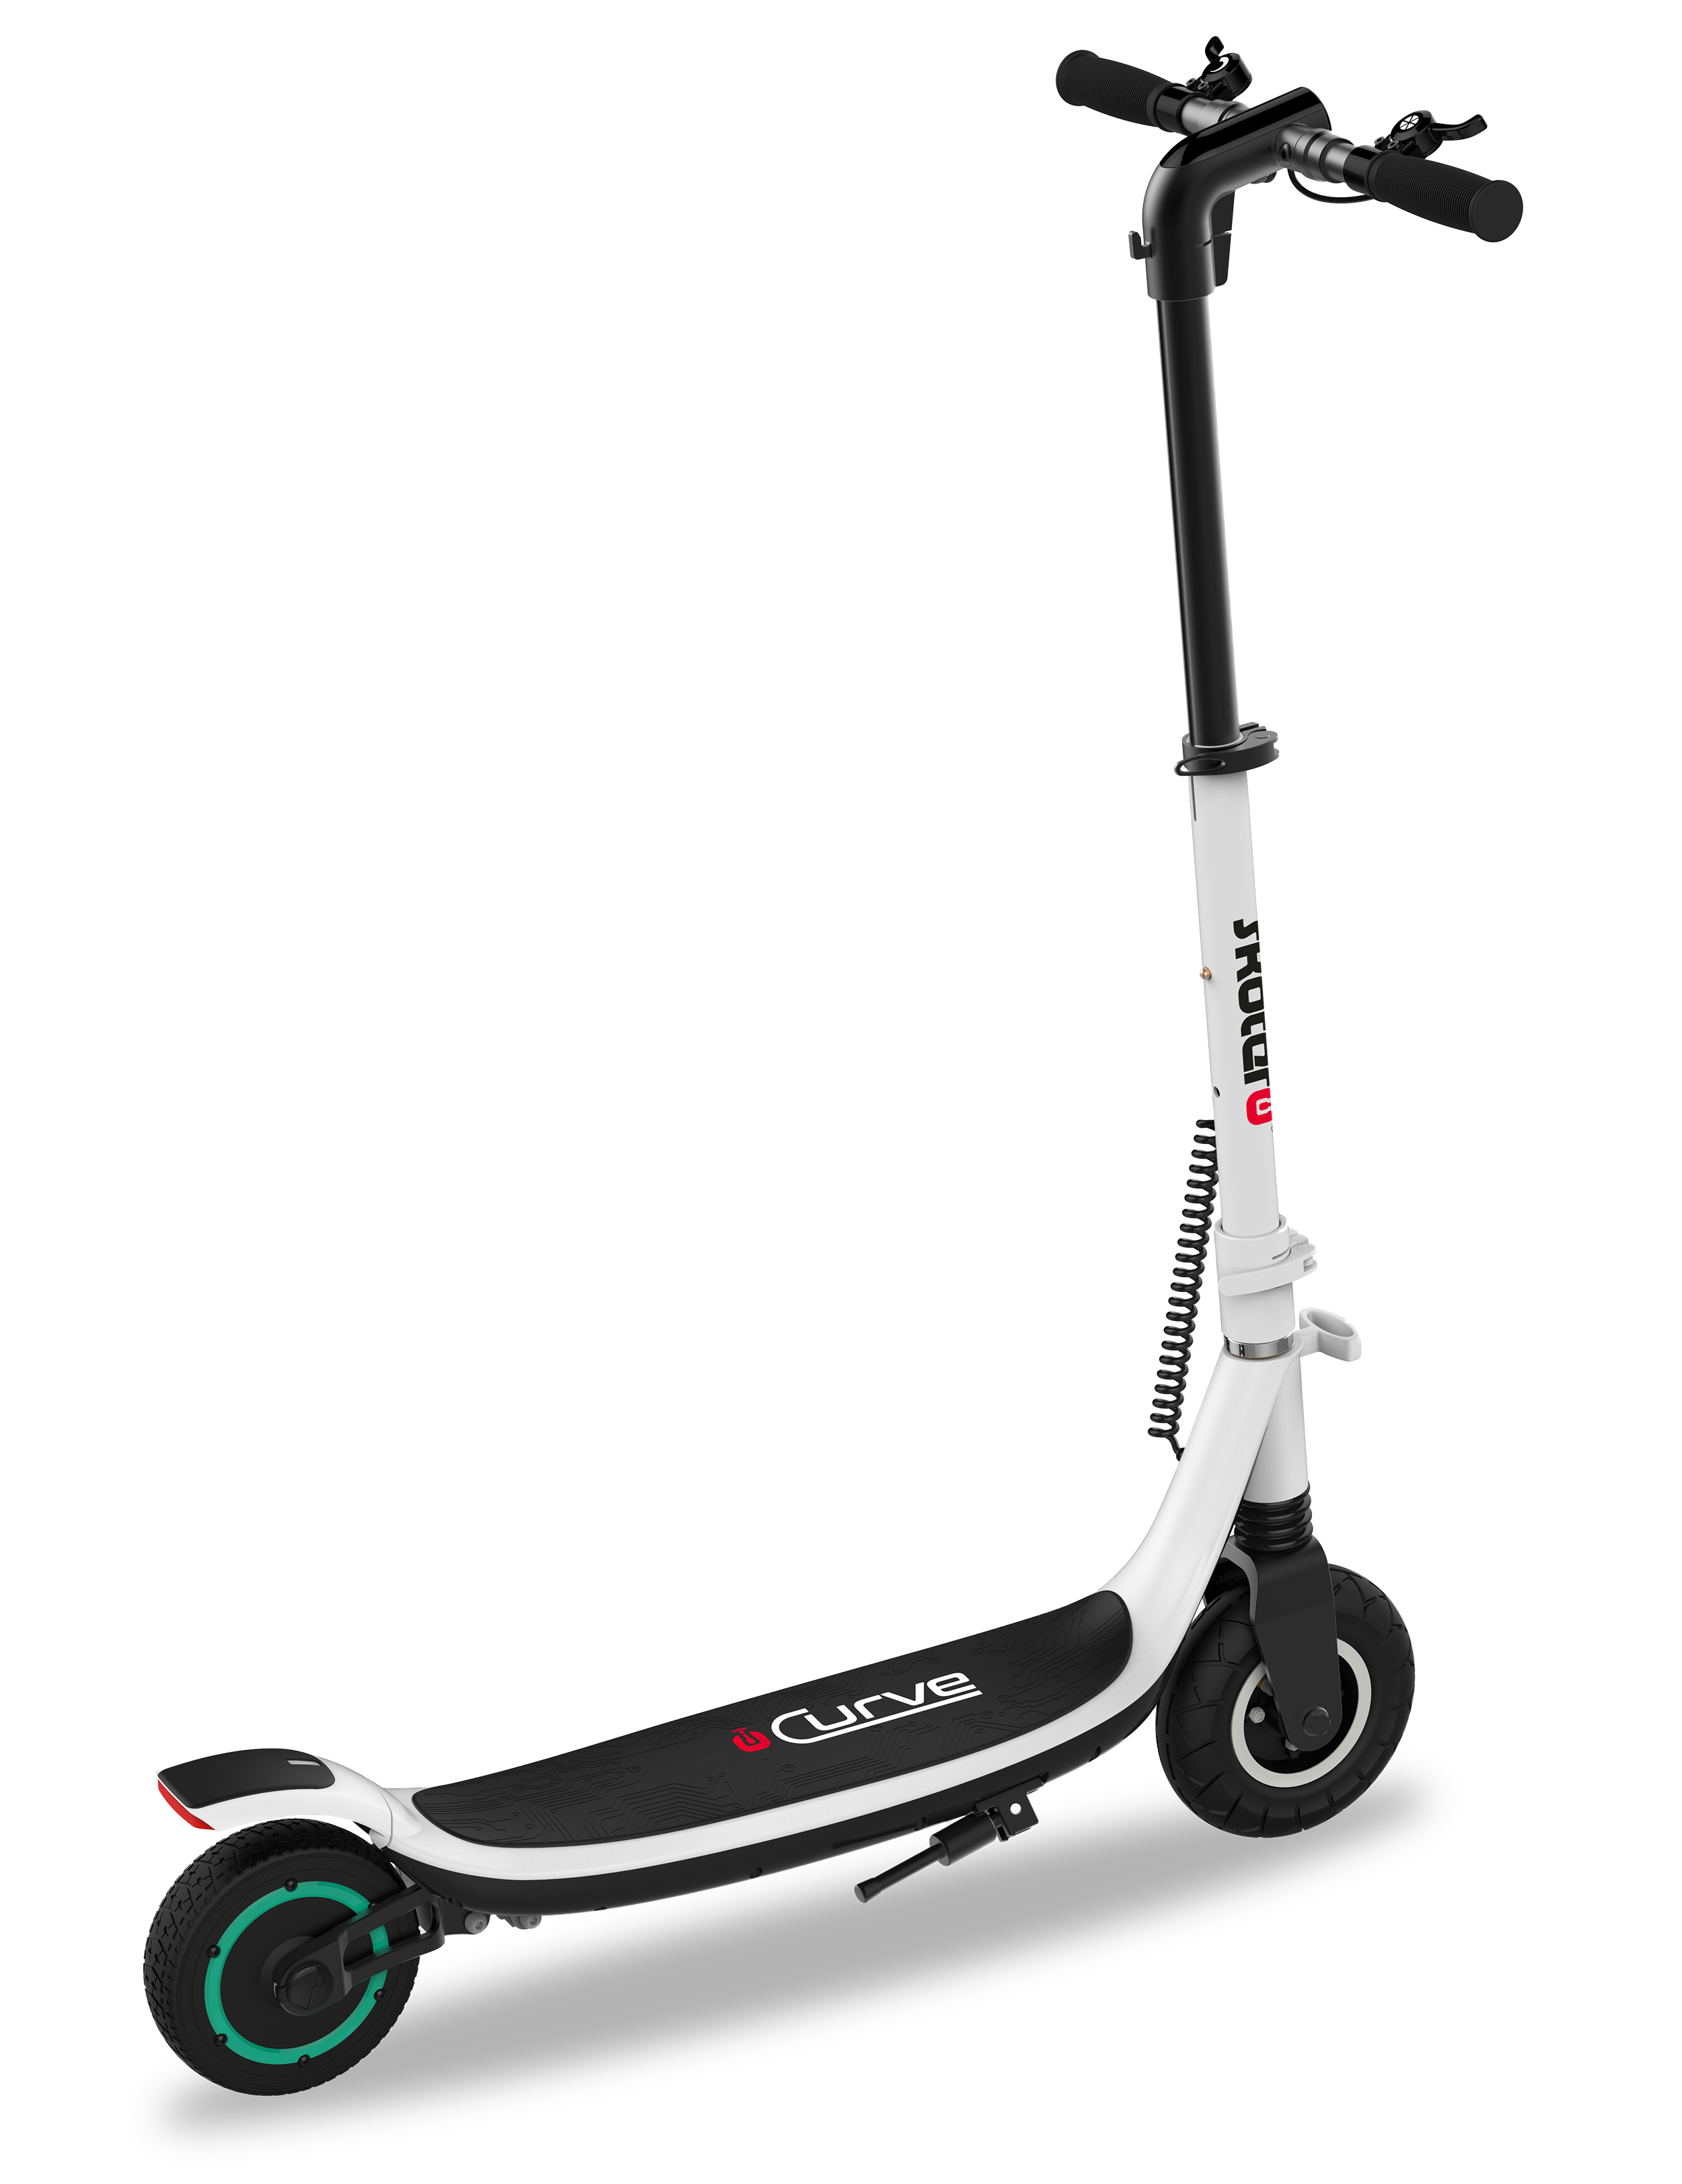 Skotero Curve Electric Scooter